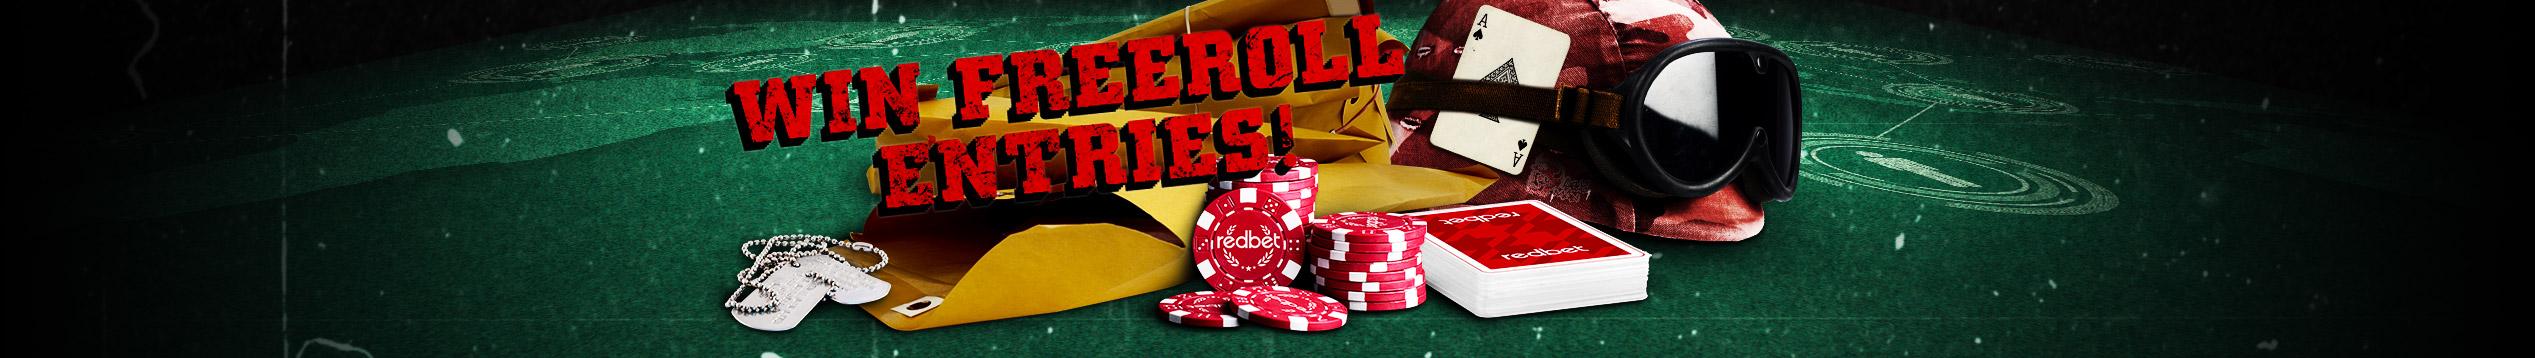 redbet Poker Mission Freerolls worth €50k!